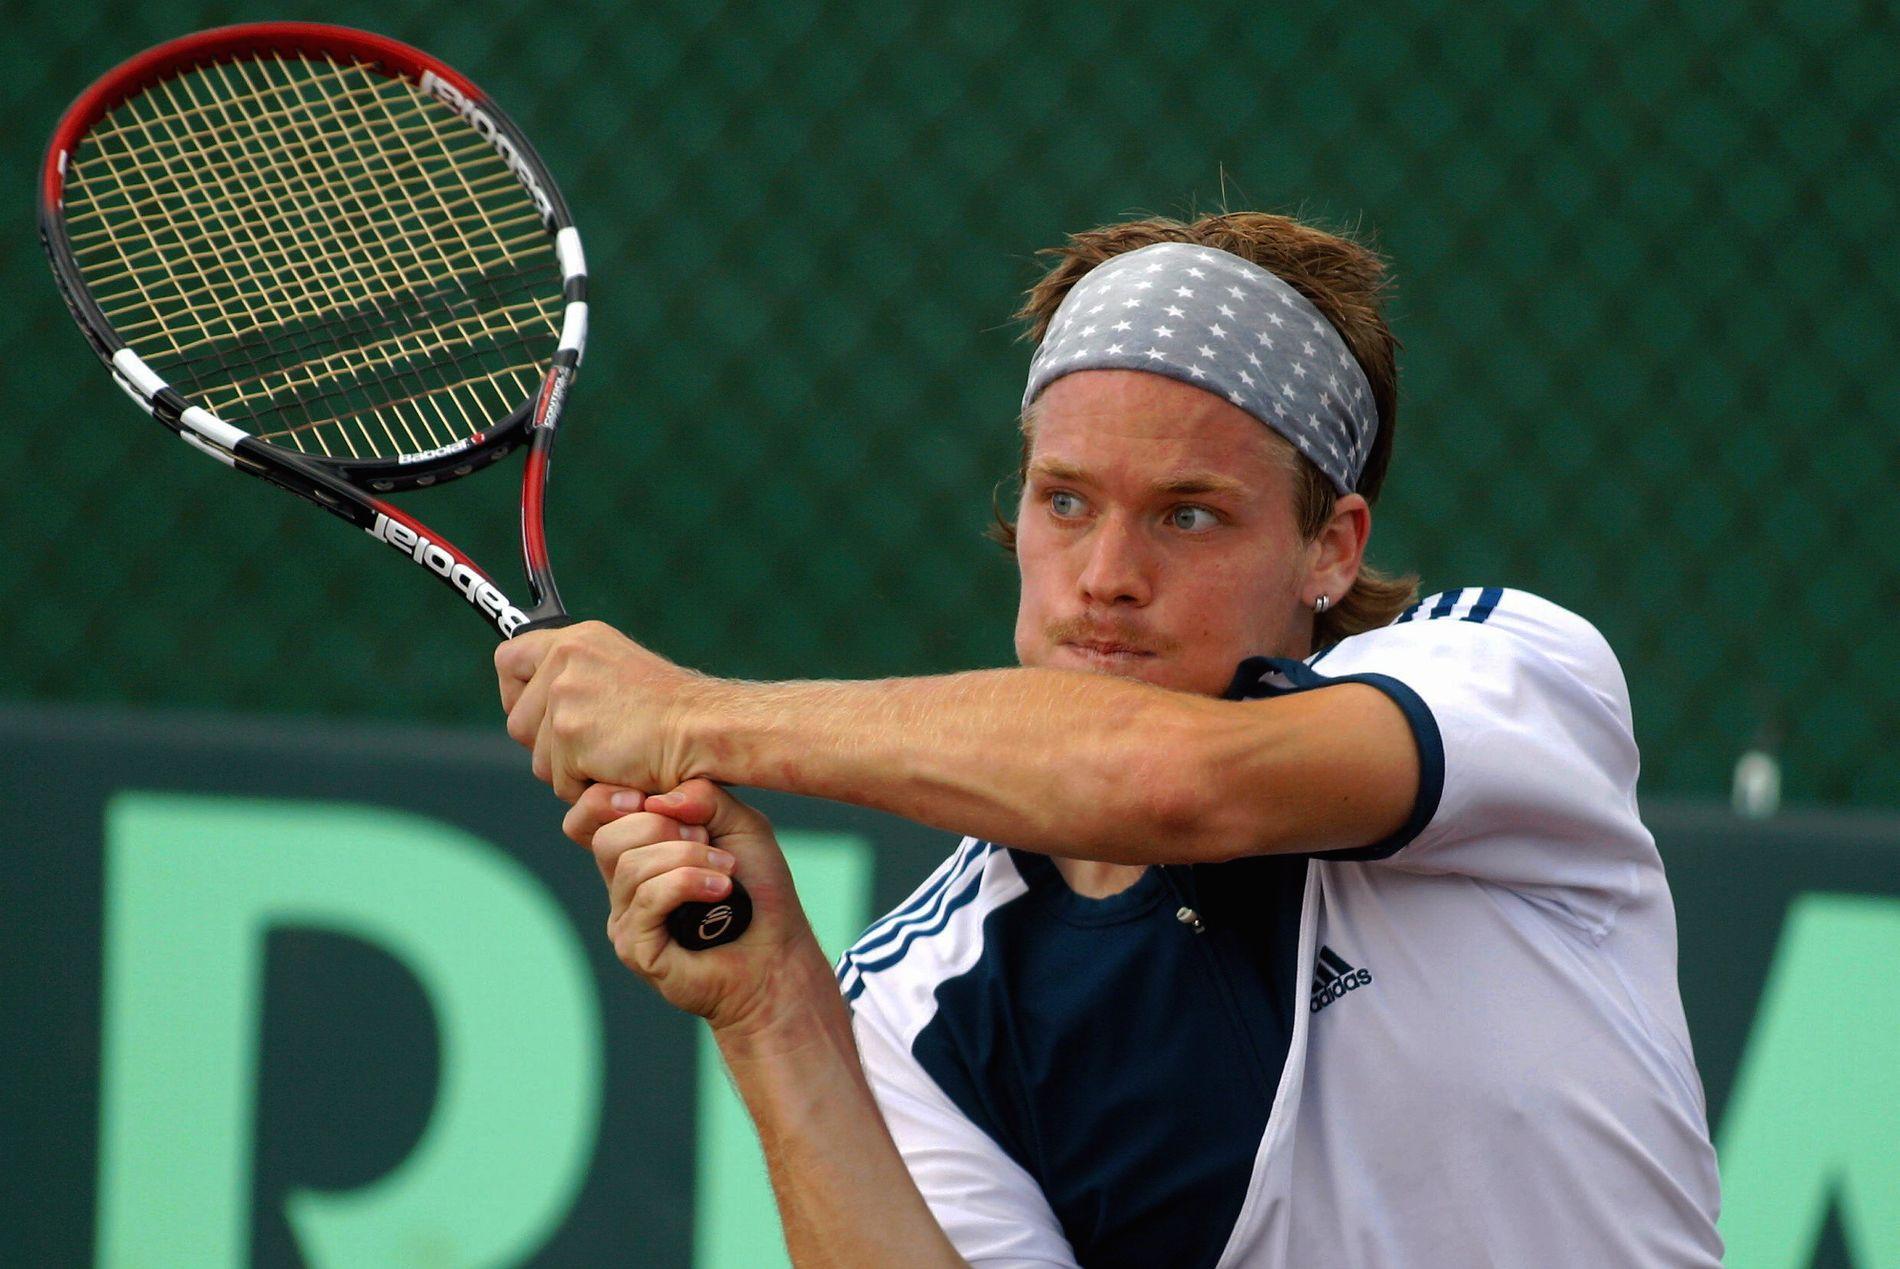 NORSK DAVIS CUP-KONGE: Stian Boretti er den nordmannen med flest kamper i Davis Cup. Her er han i aksjon under turneringen i Asker i 2002.